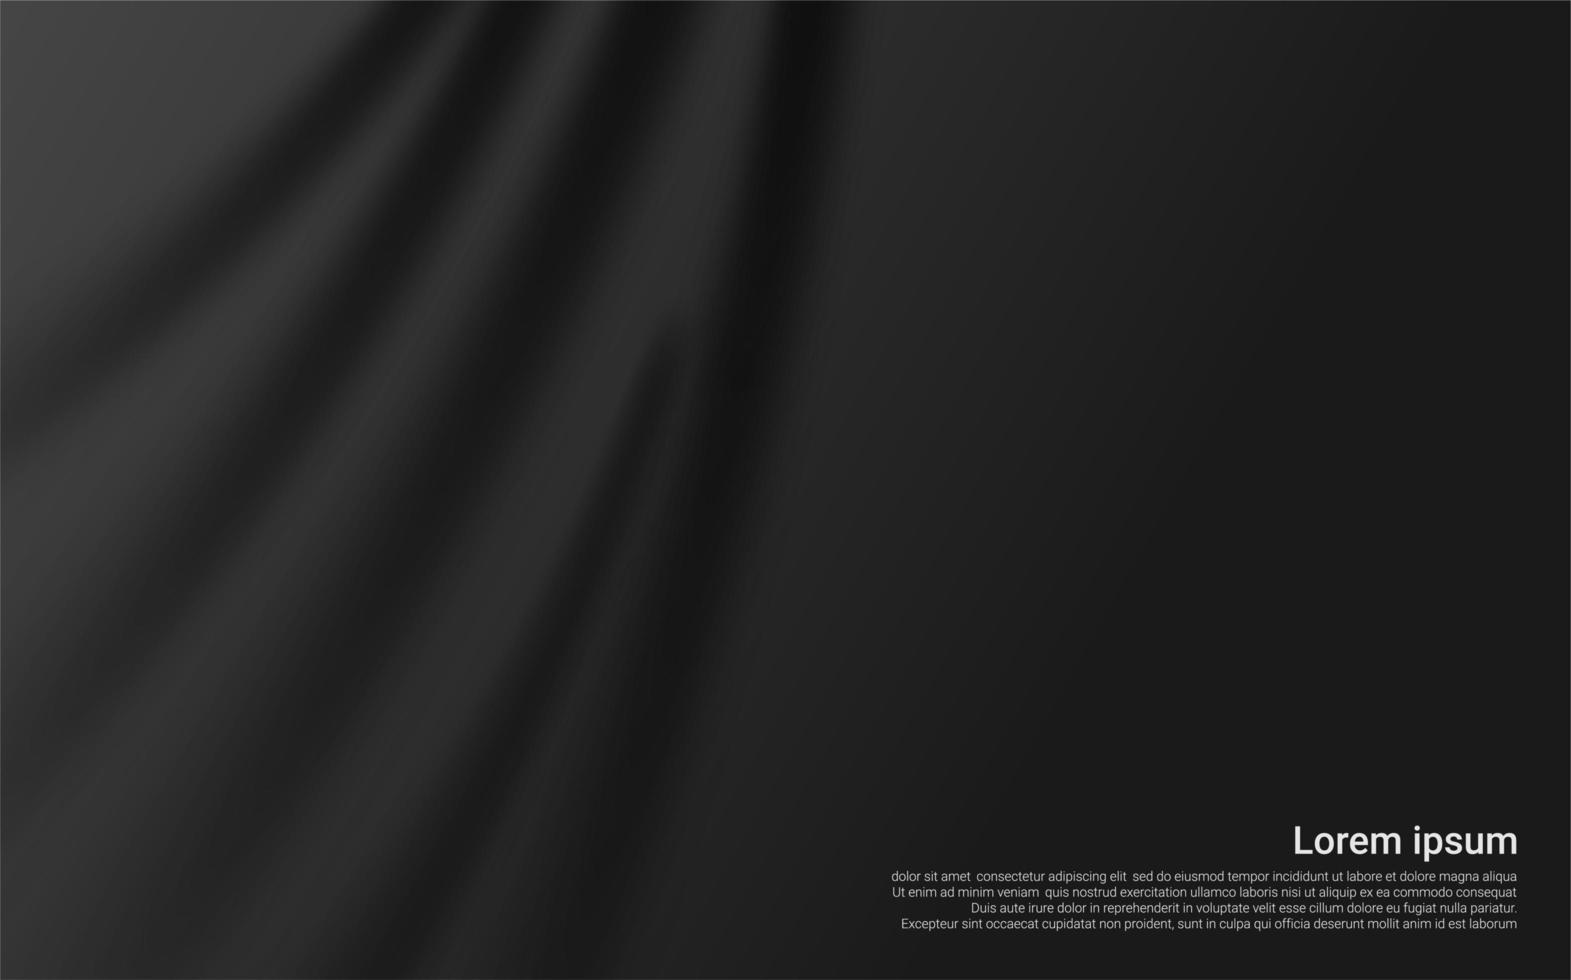 textura de cortina negra de lujo vector